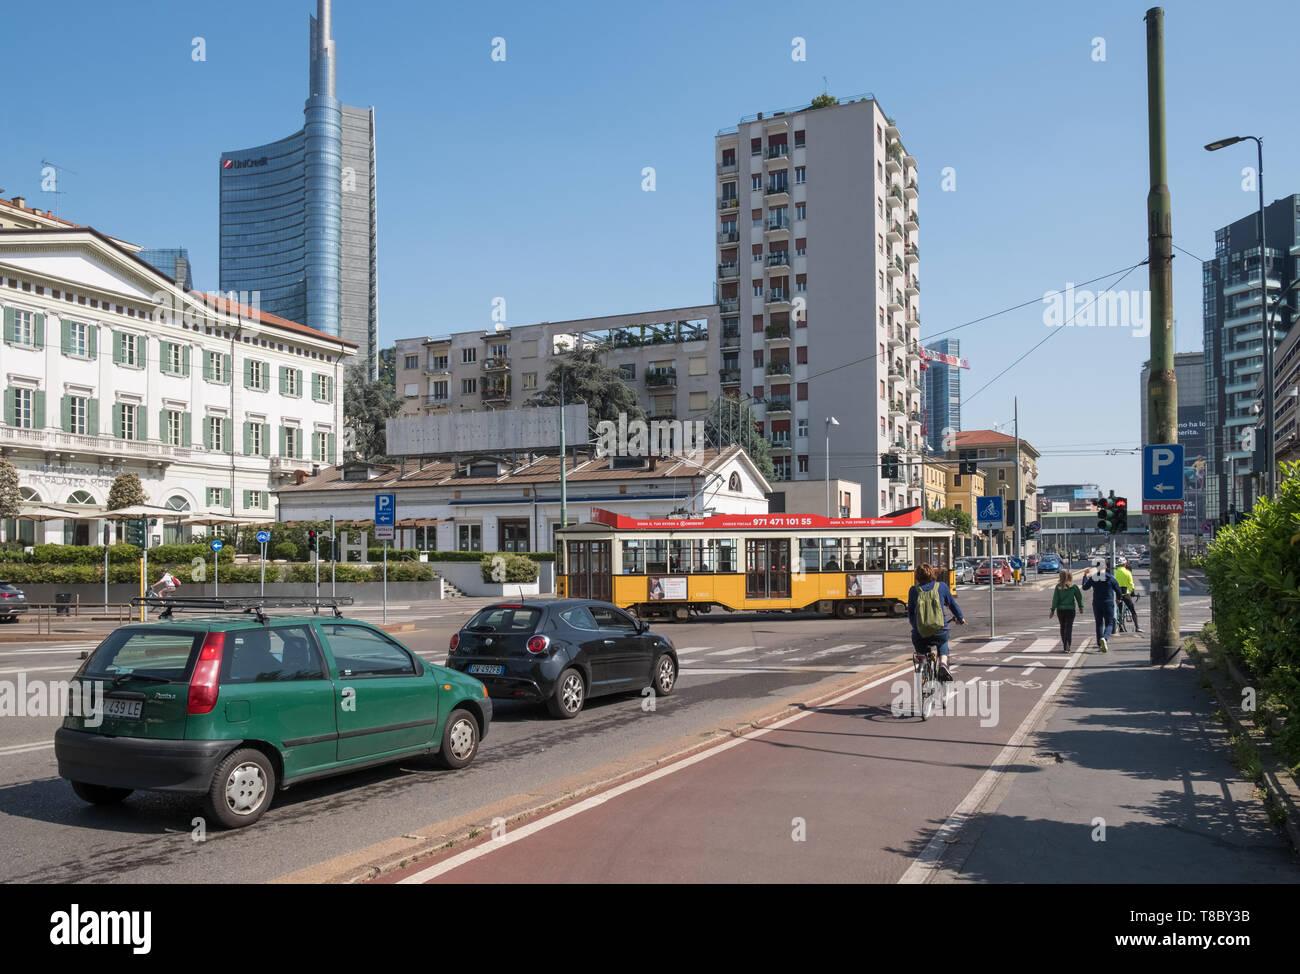 Street scene, Porta Nuova district, Milan, Italy Stock Photo